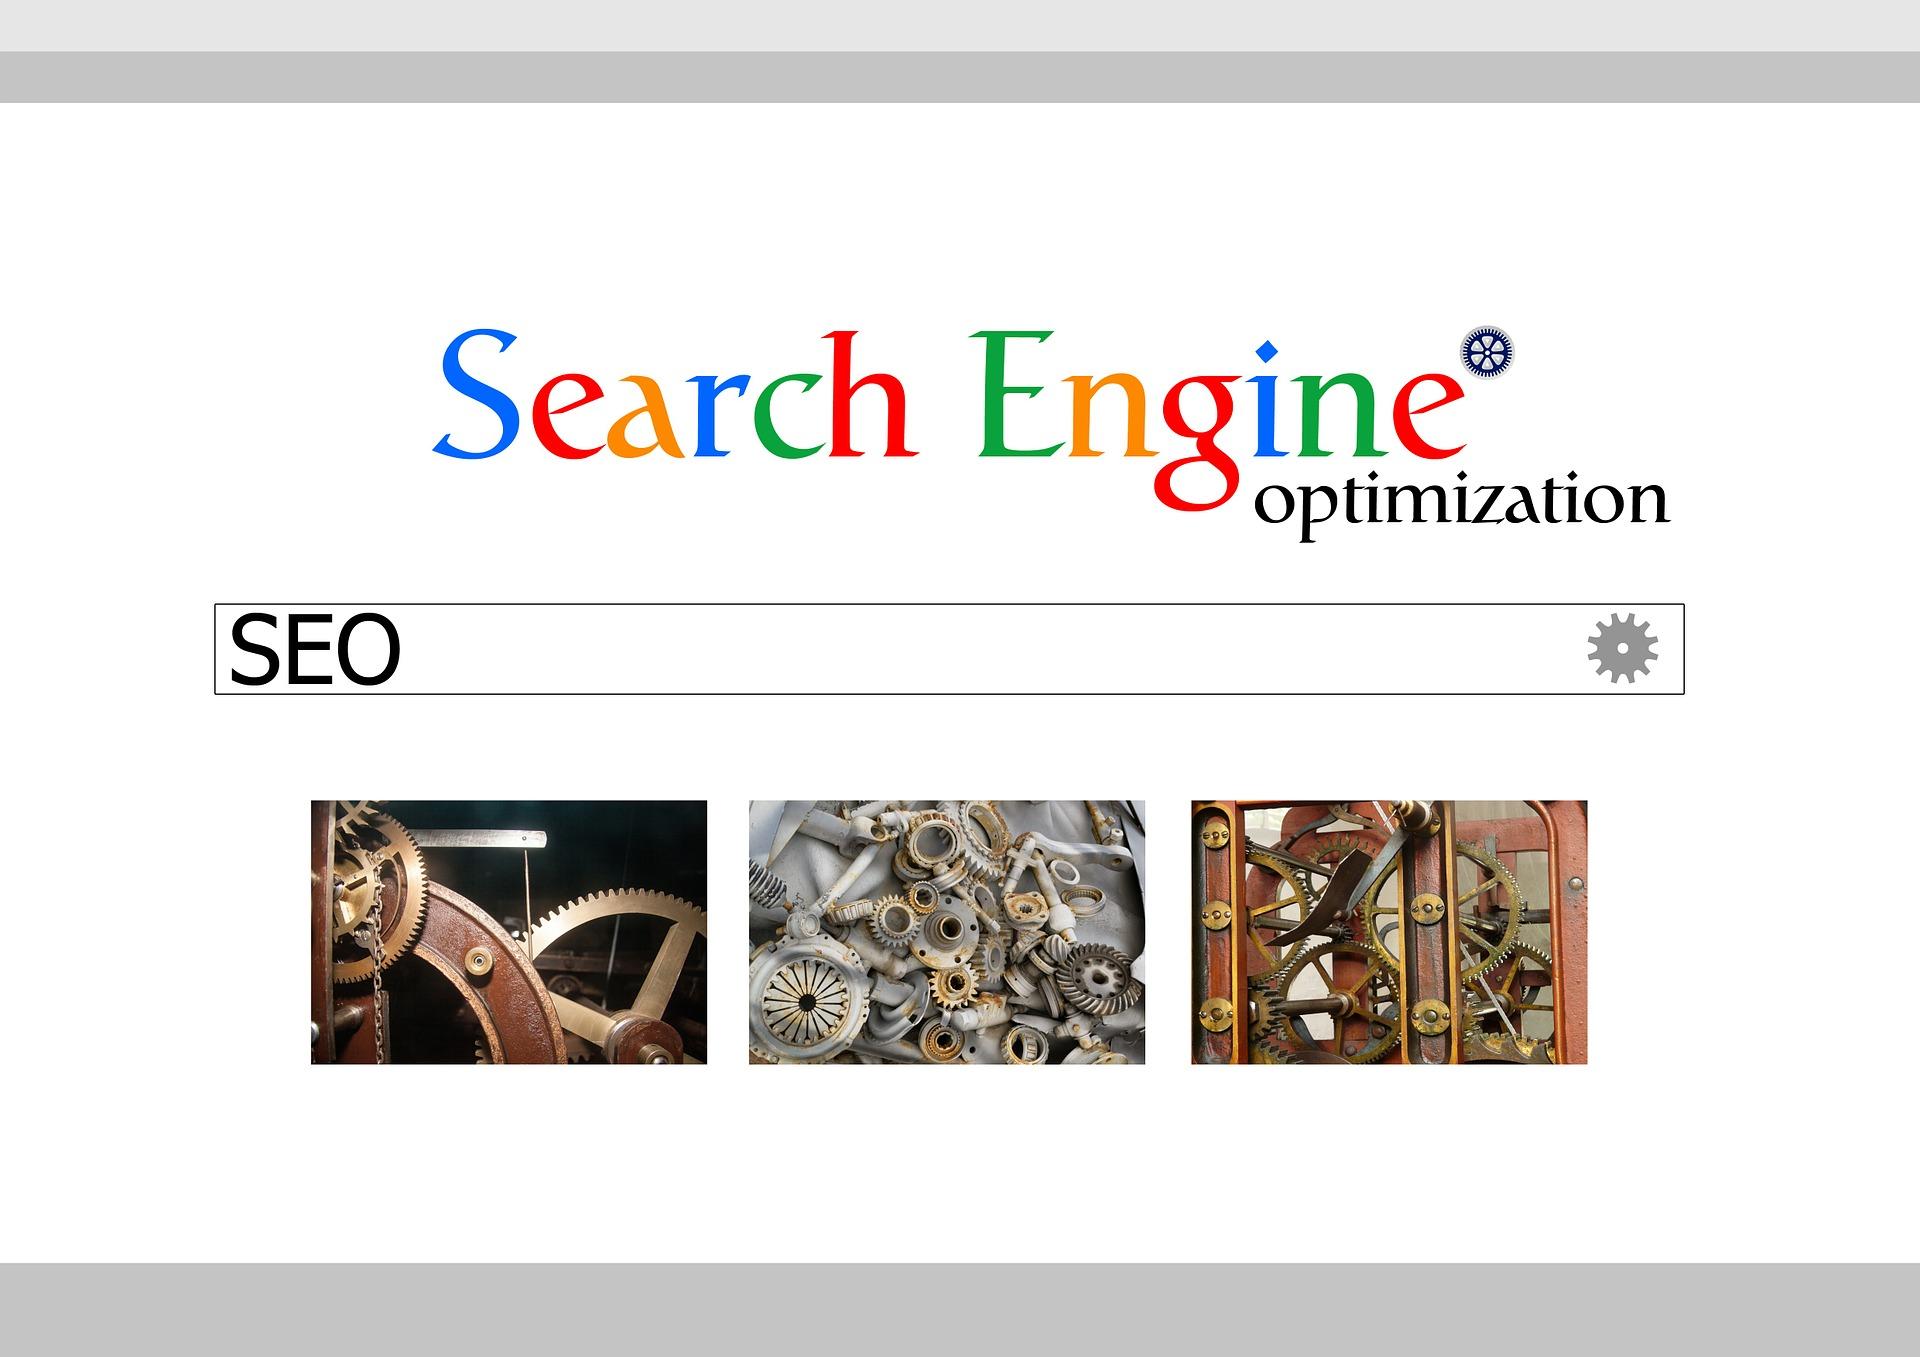 Is it worth optimising for Bing or Yahoo?